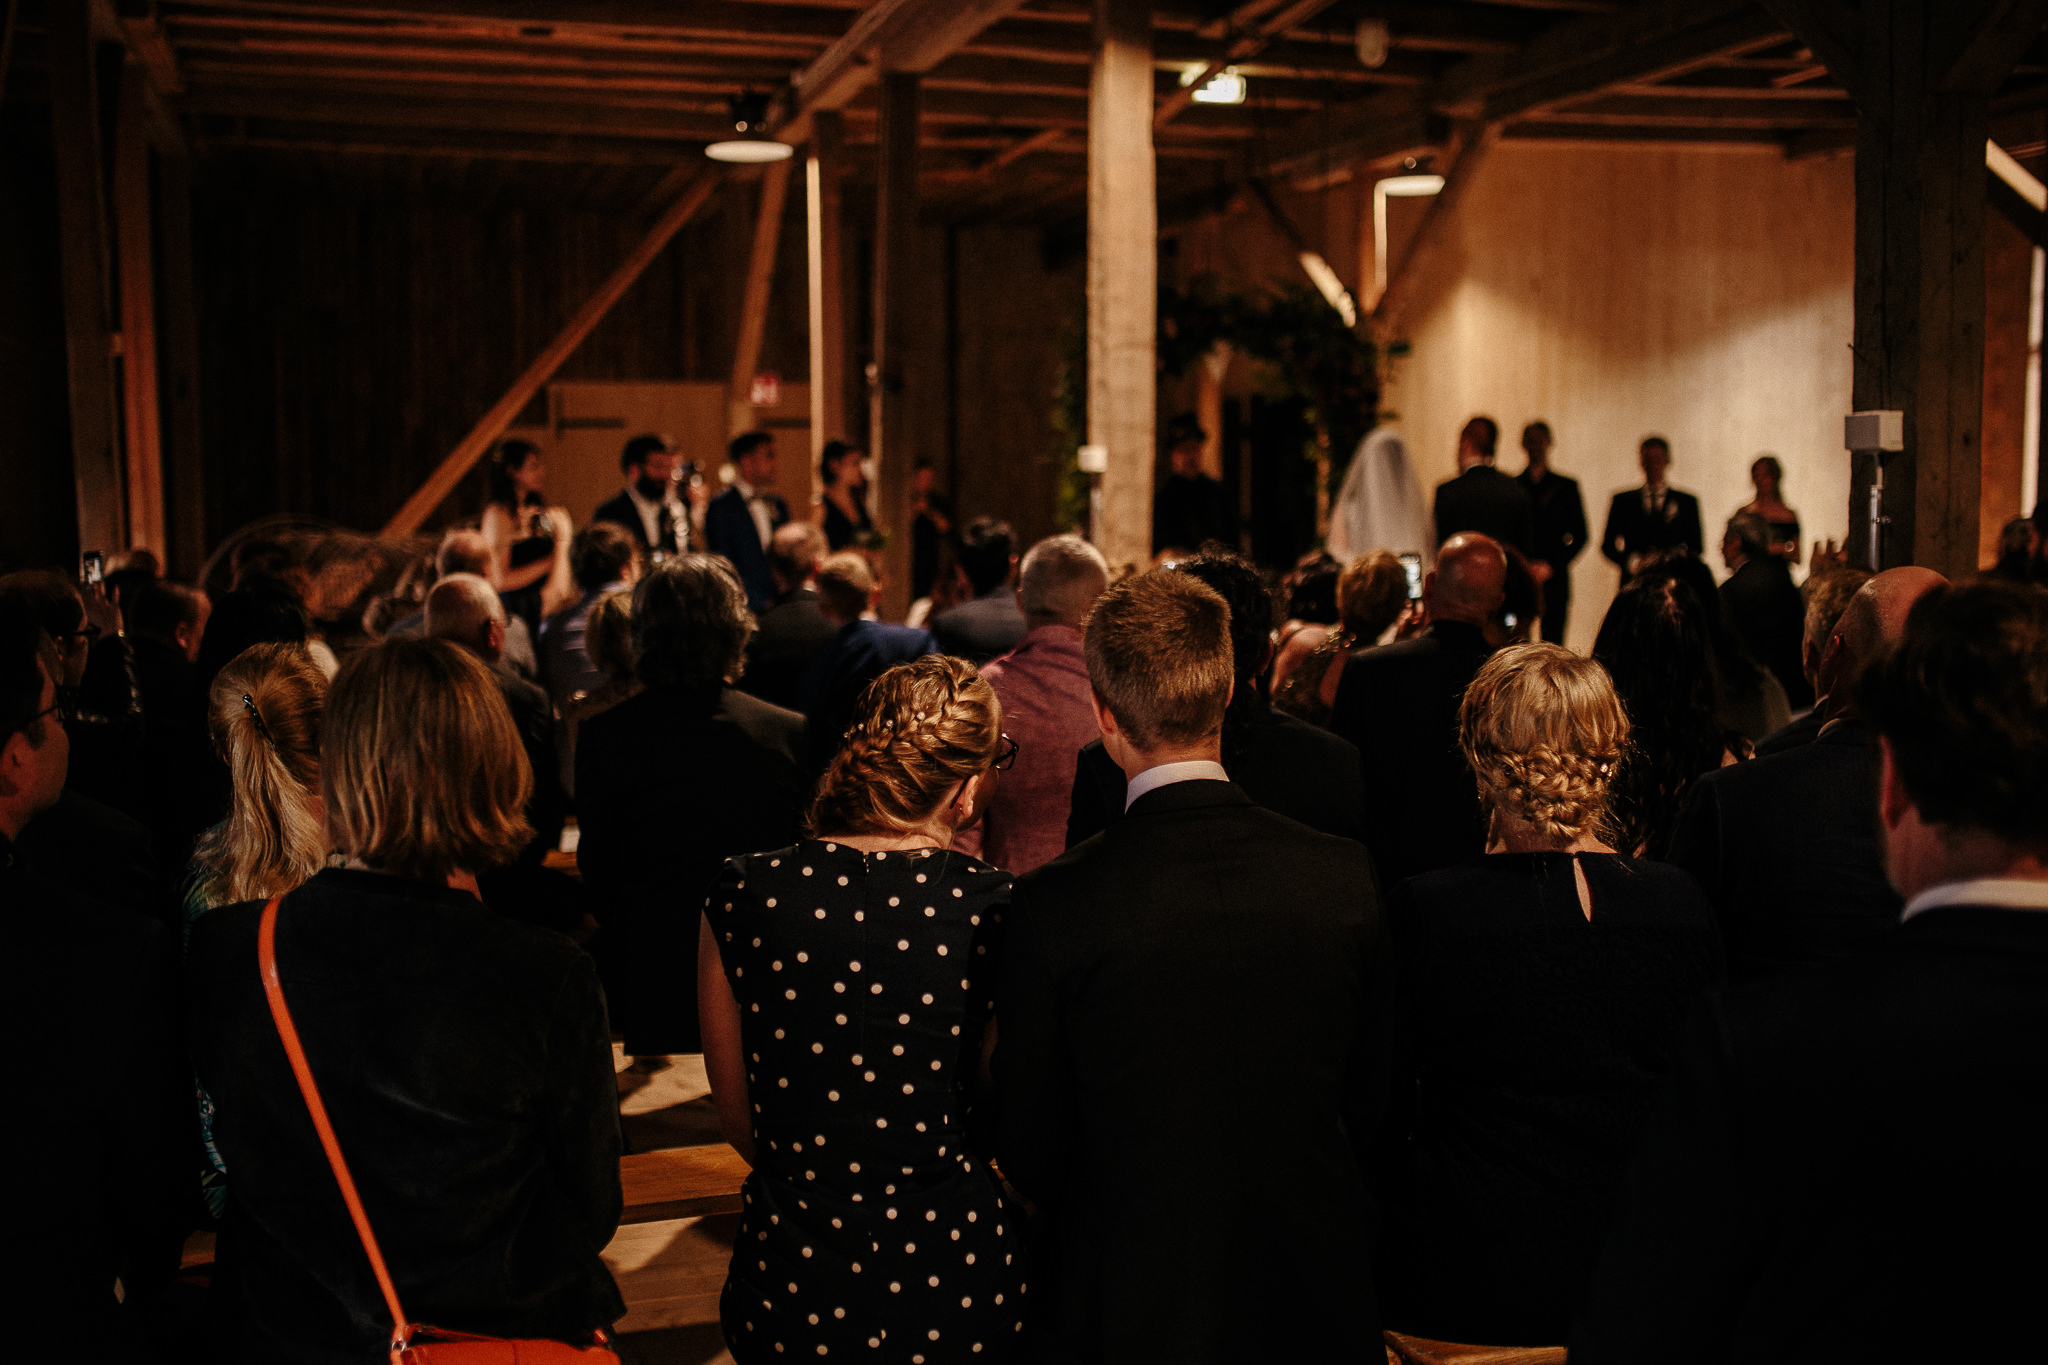 Ceren & Jani - Finland Wedding Photographer - Weddings by Qay - Wedding Photographer (96 of 166).jpg